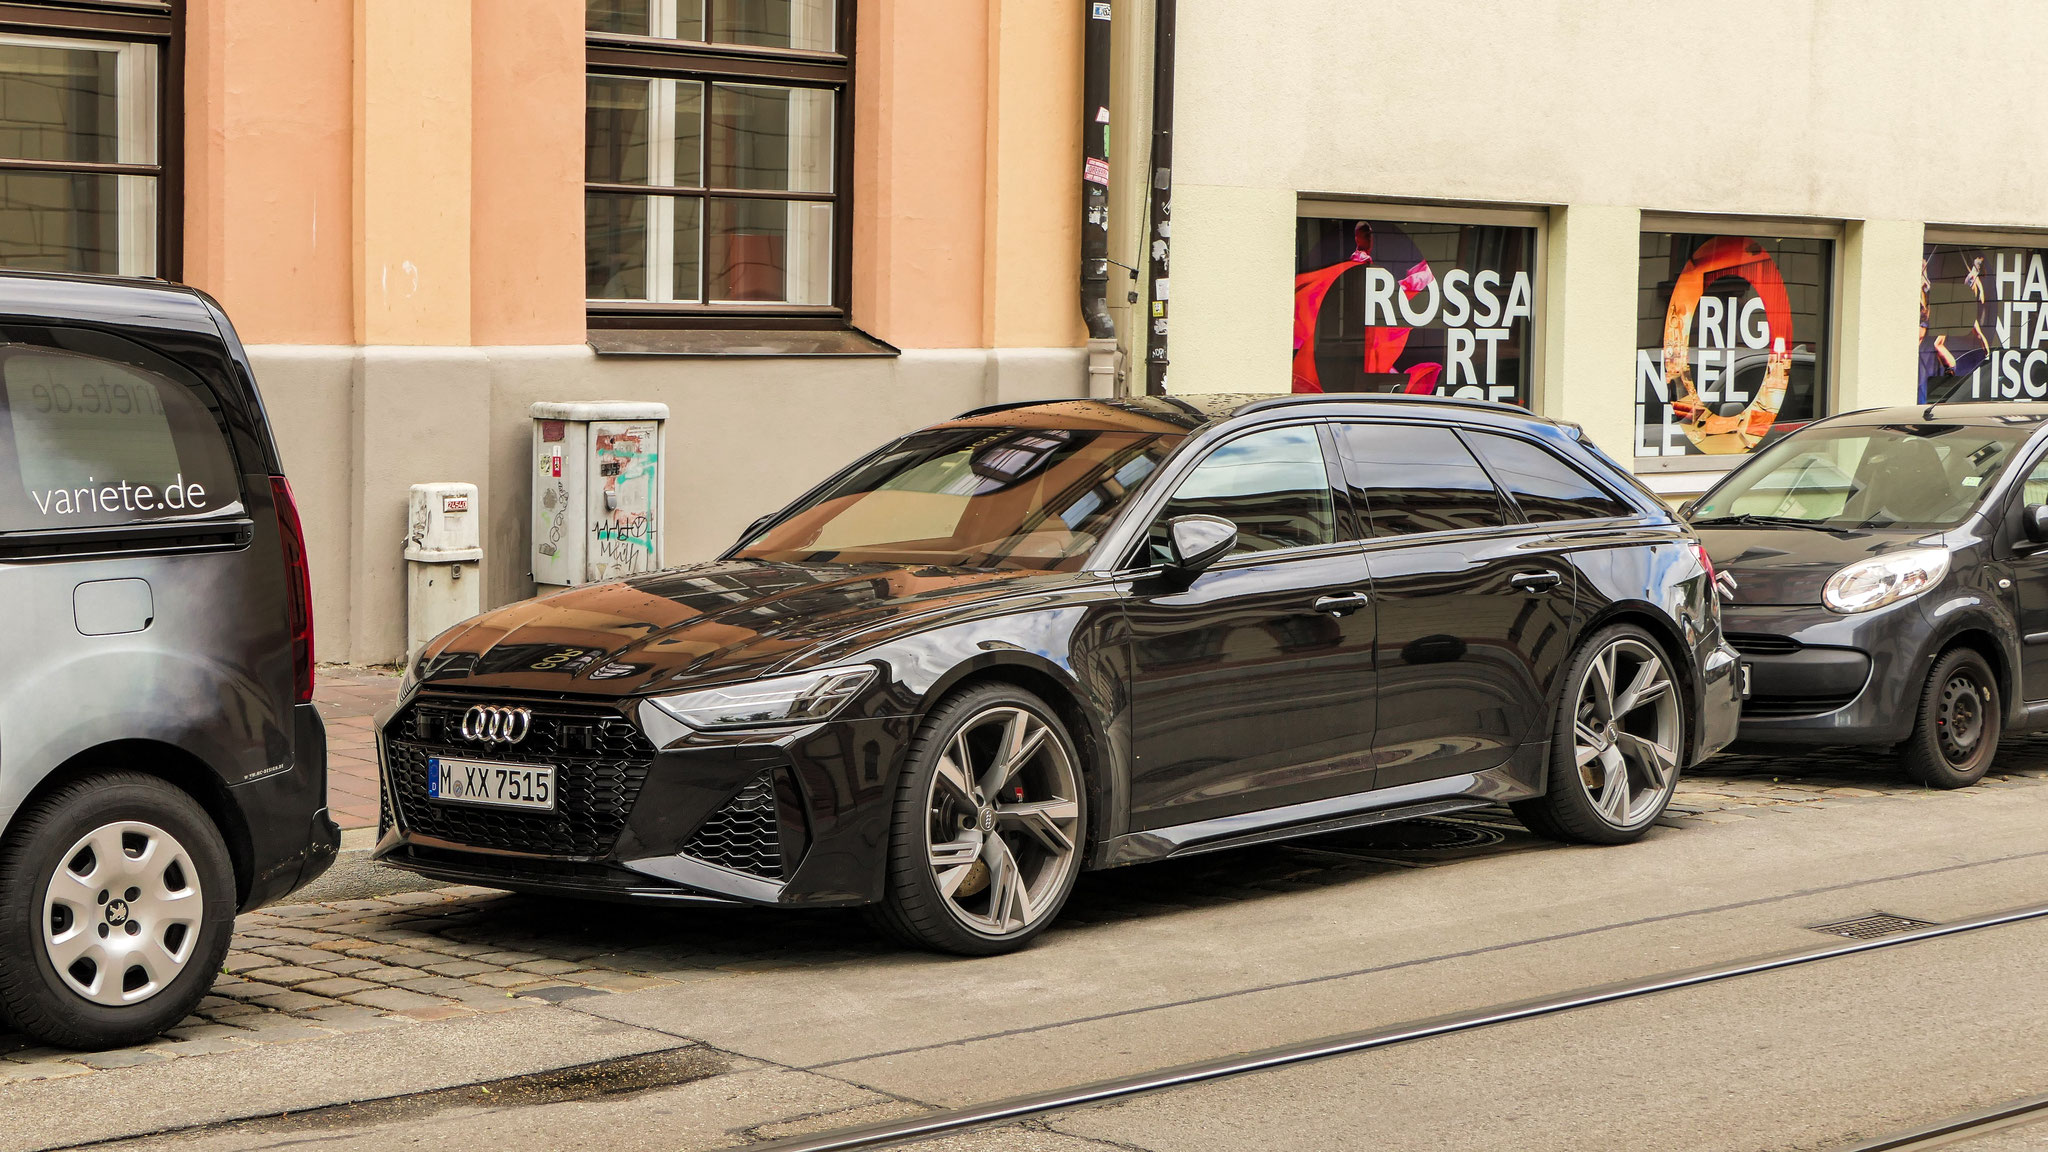 Audi RS6 - M-XX-7515